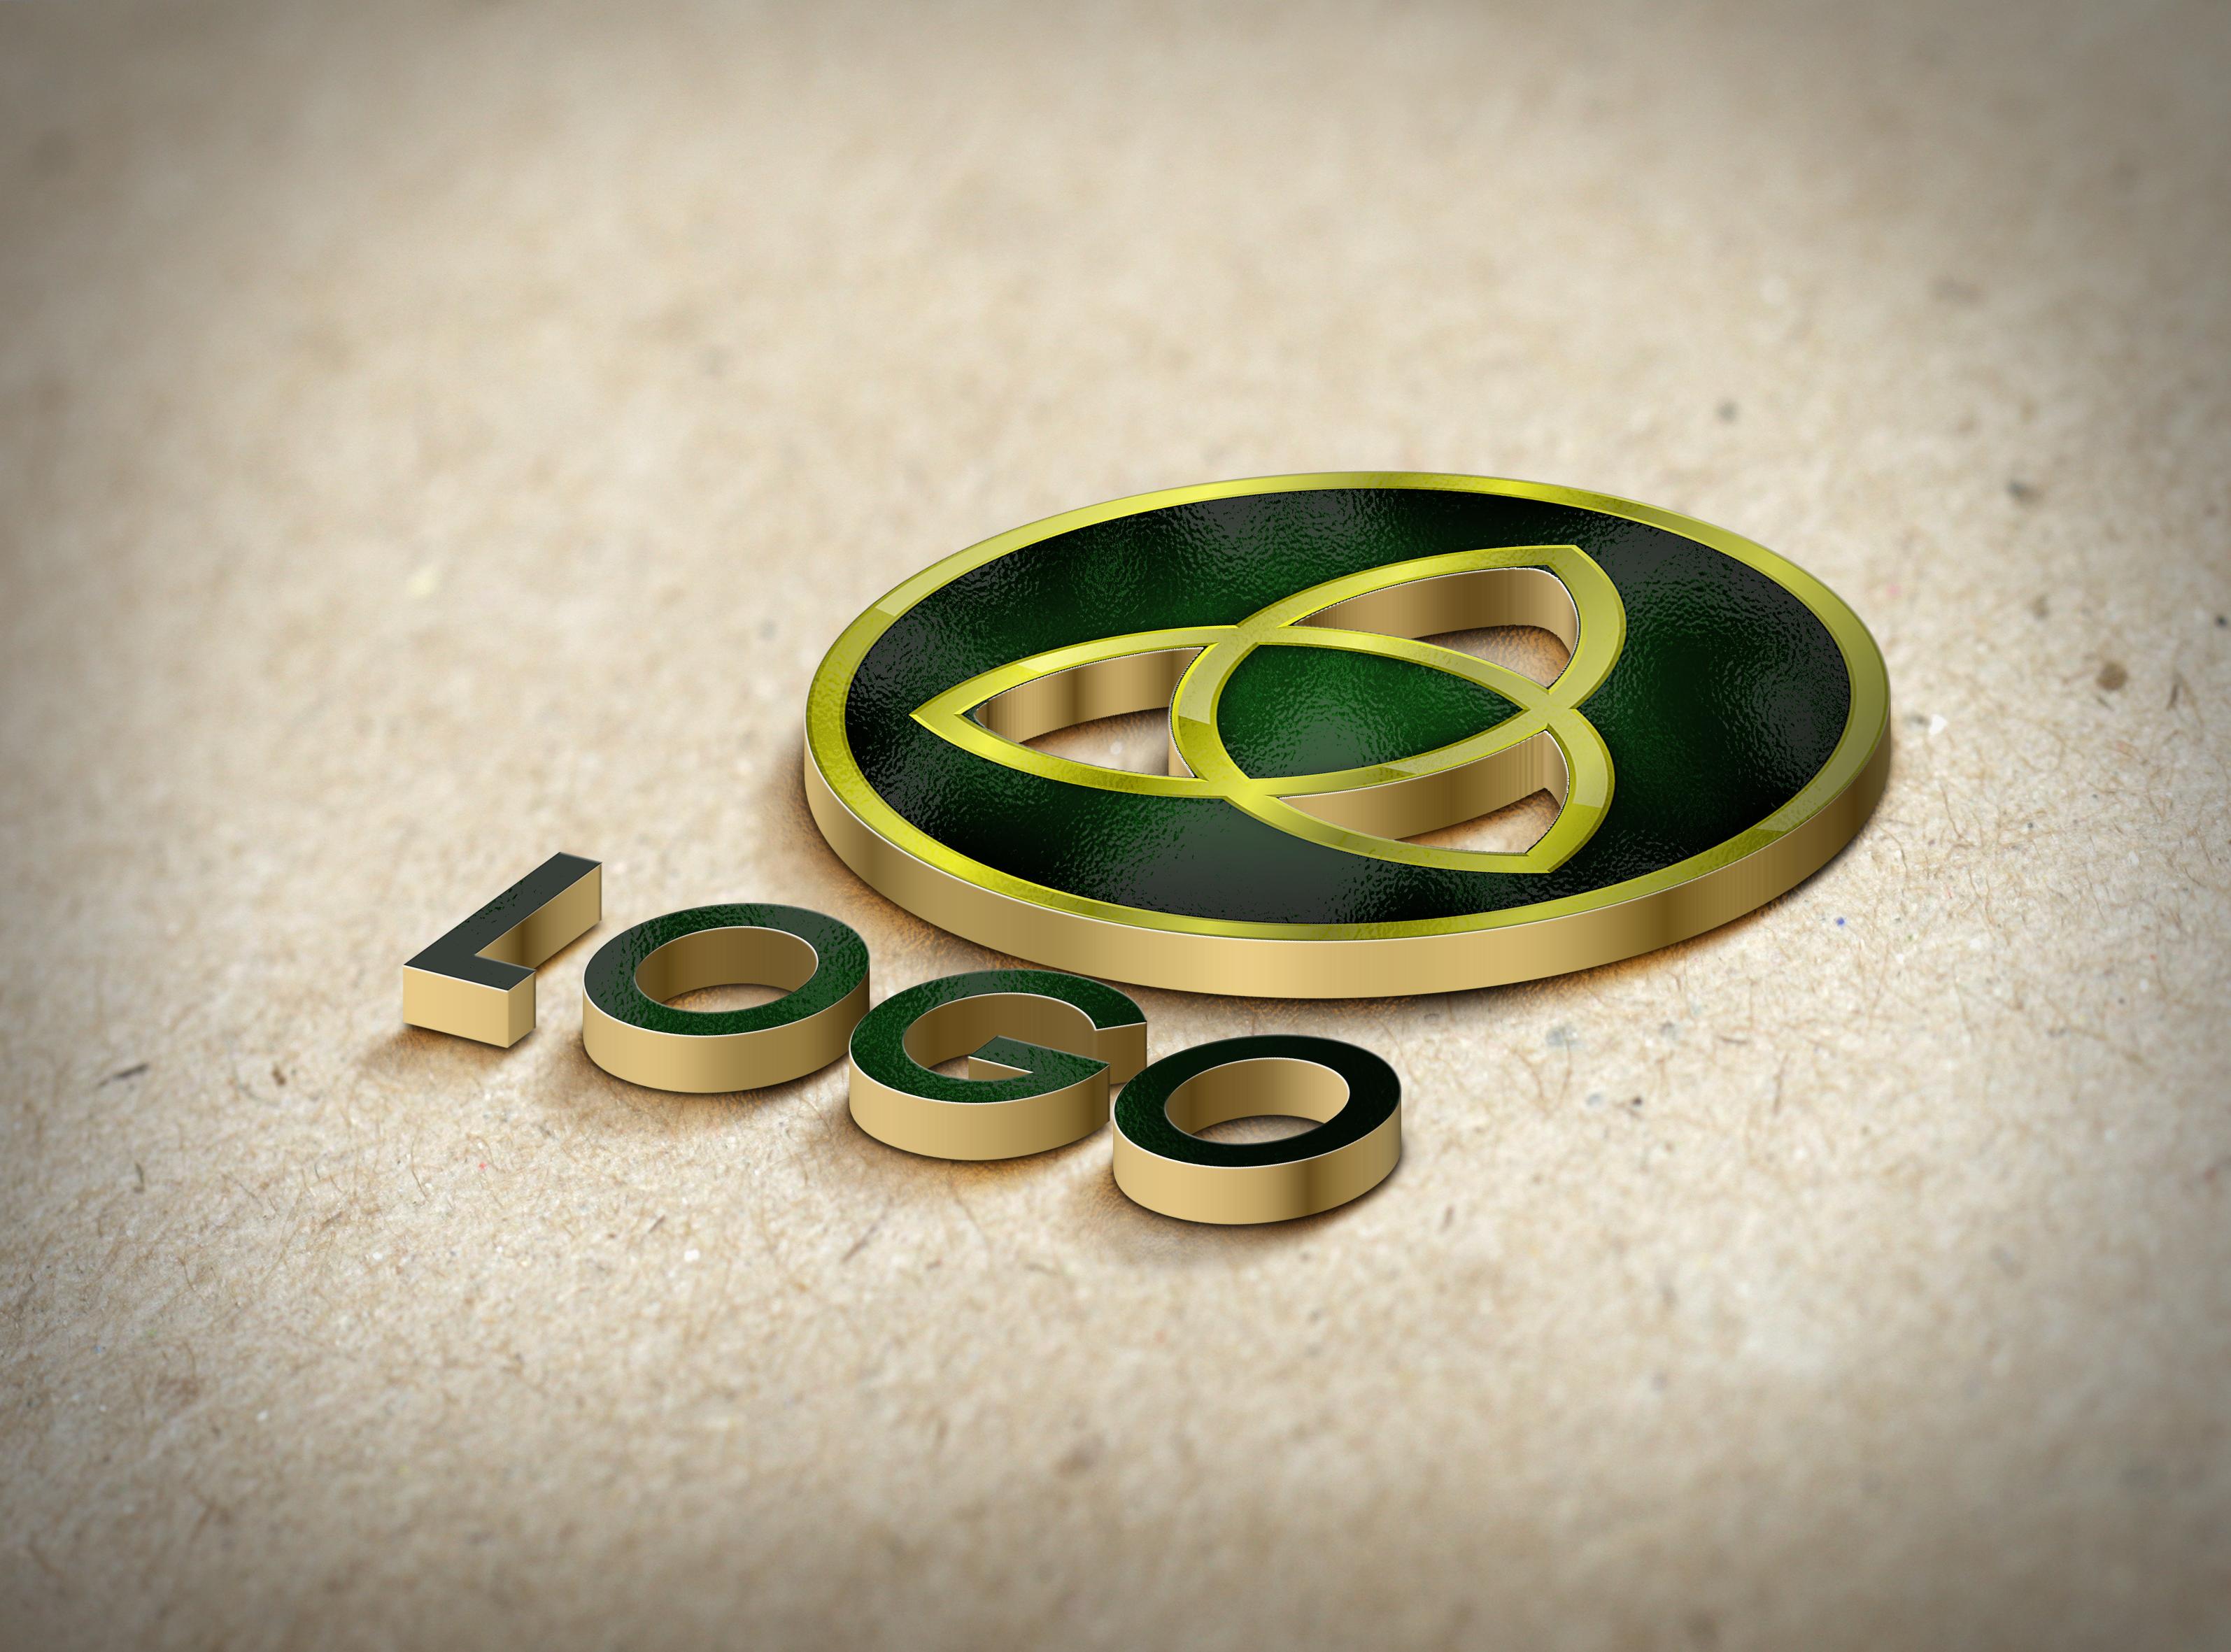 convert your text or logo into 3D MockUp design - sample no3